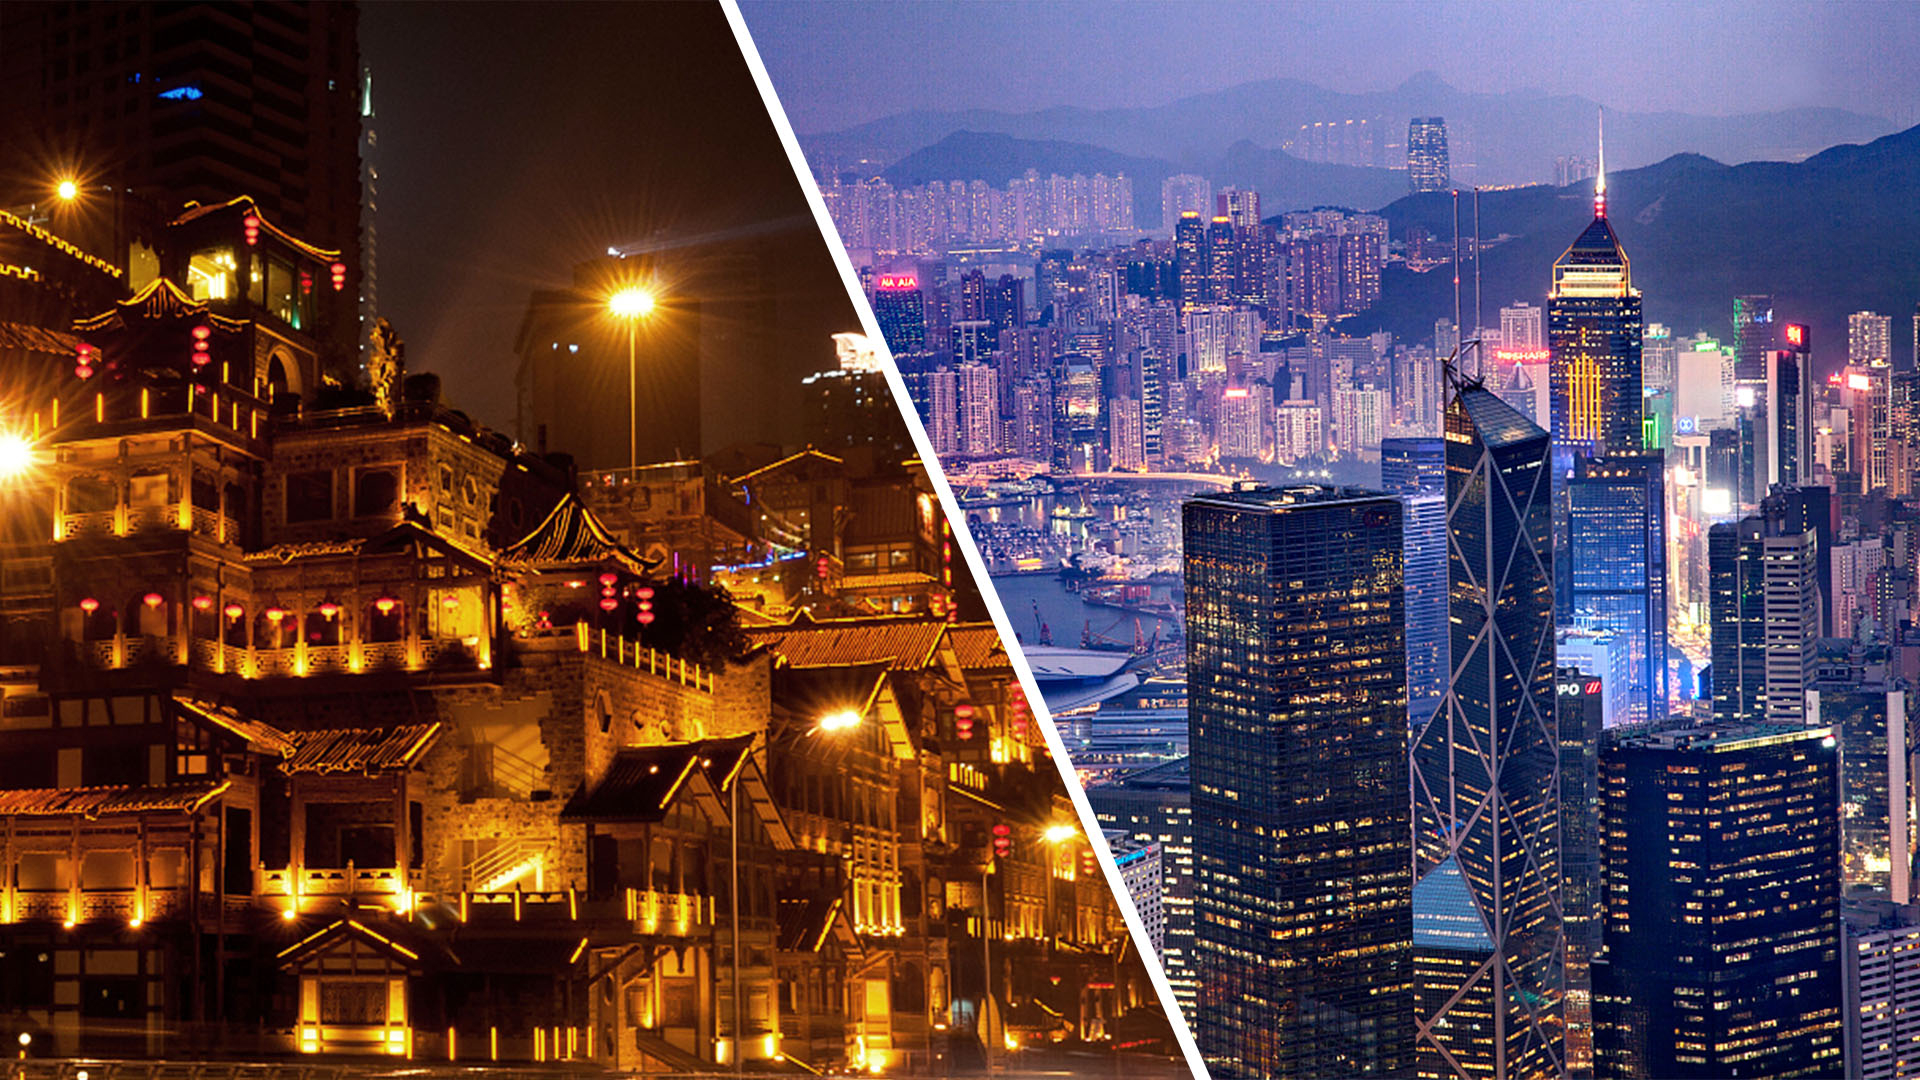 High-speed railway direct service to link Chongqing, Hong Kong